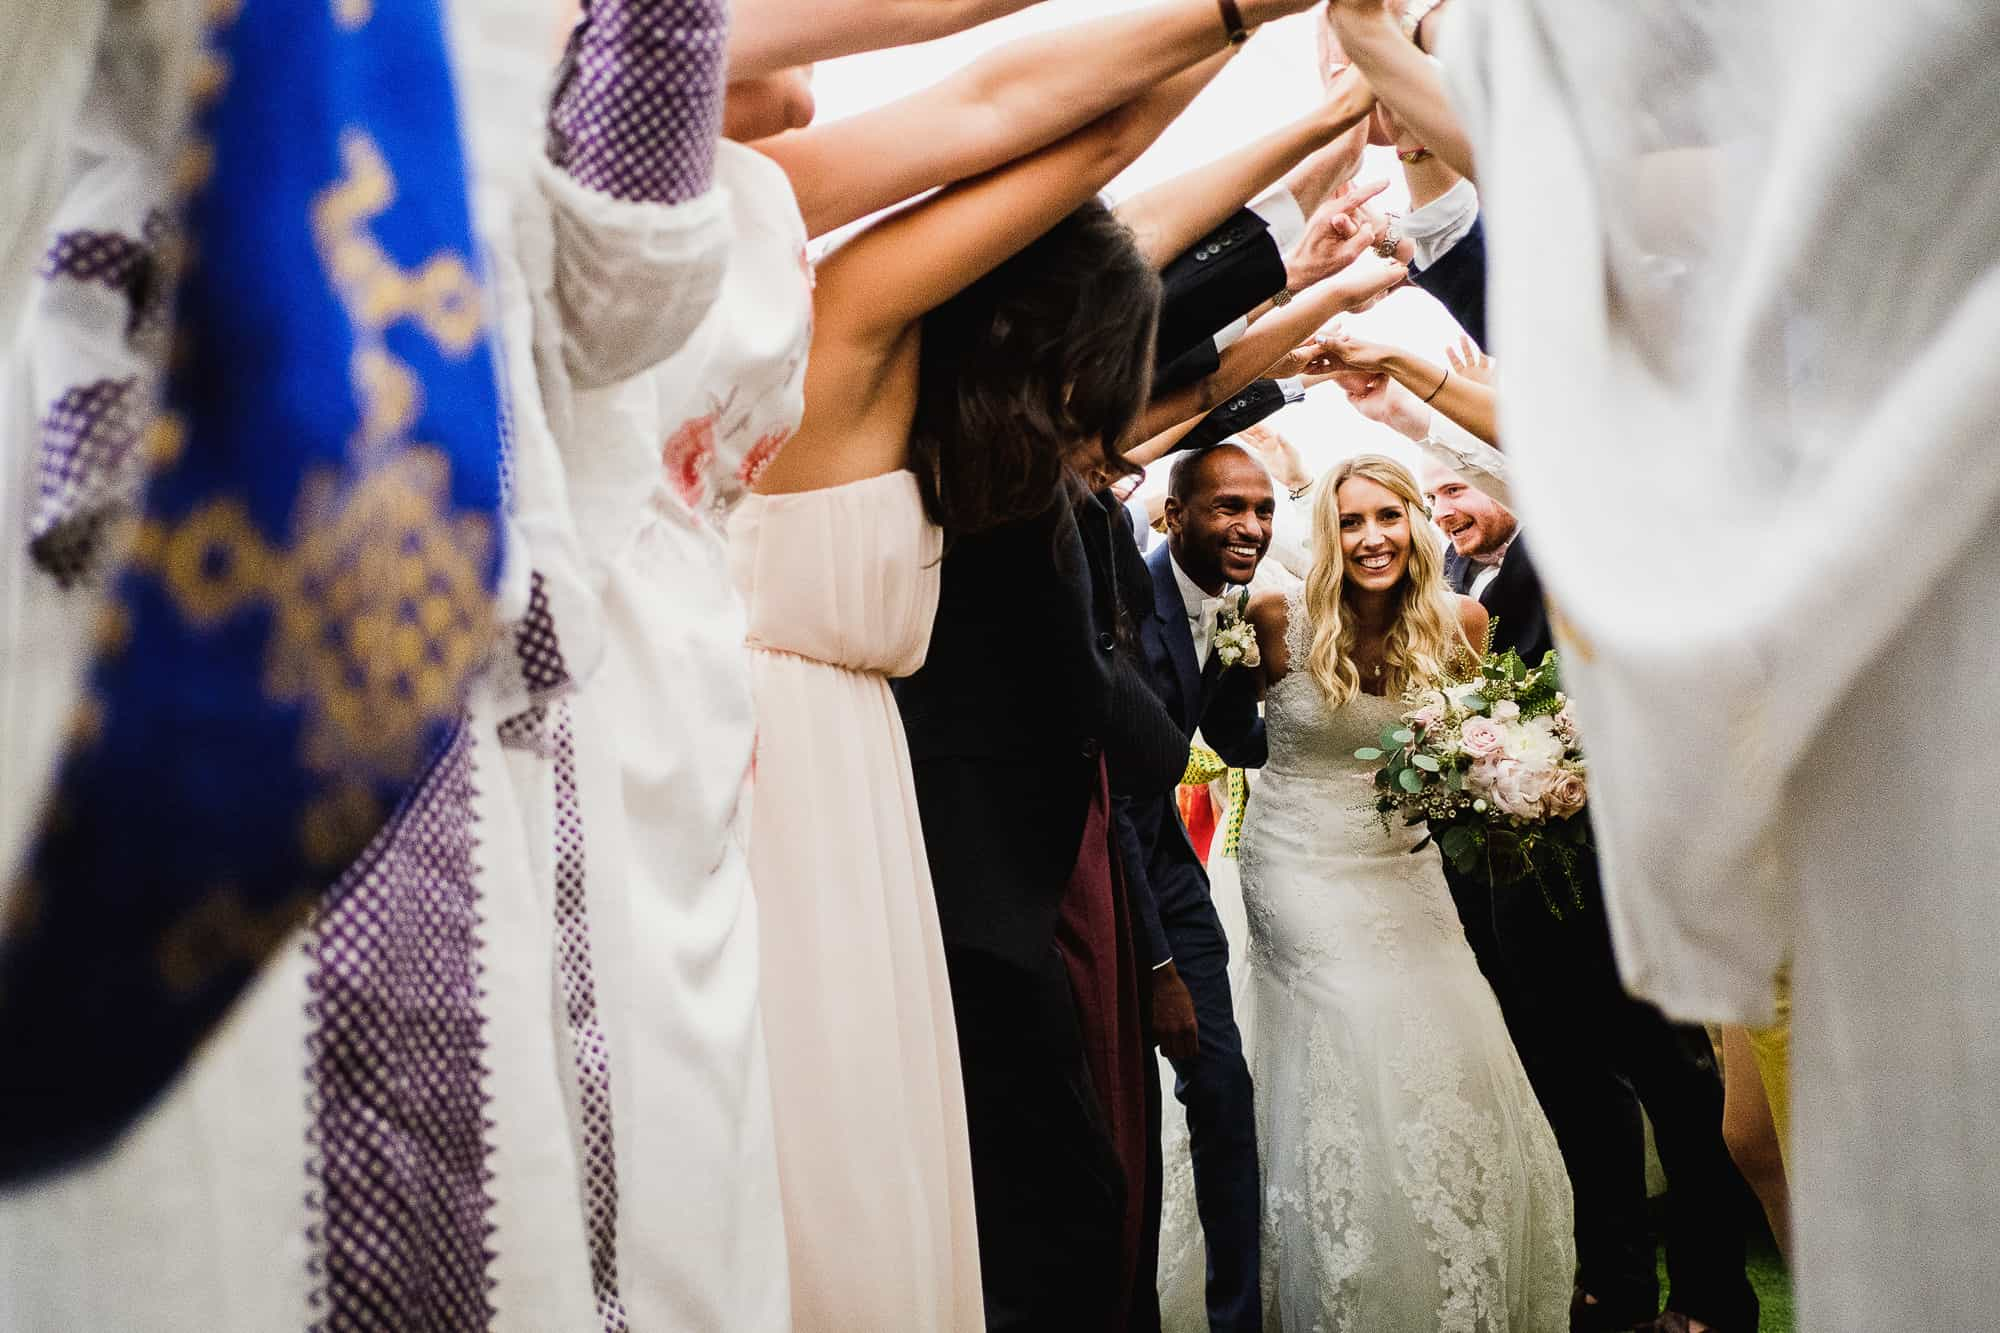 marleybrook-house-wedding-photography-matt-tyler-0046